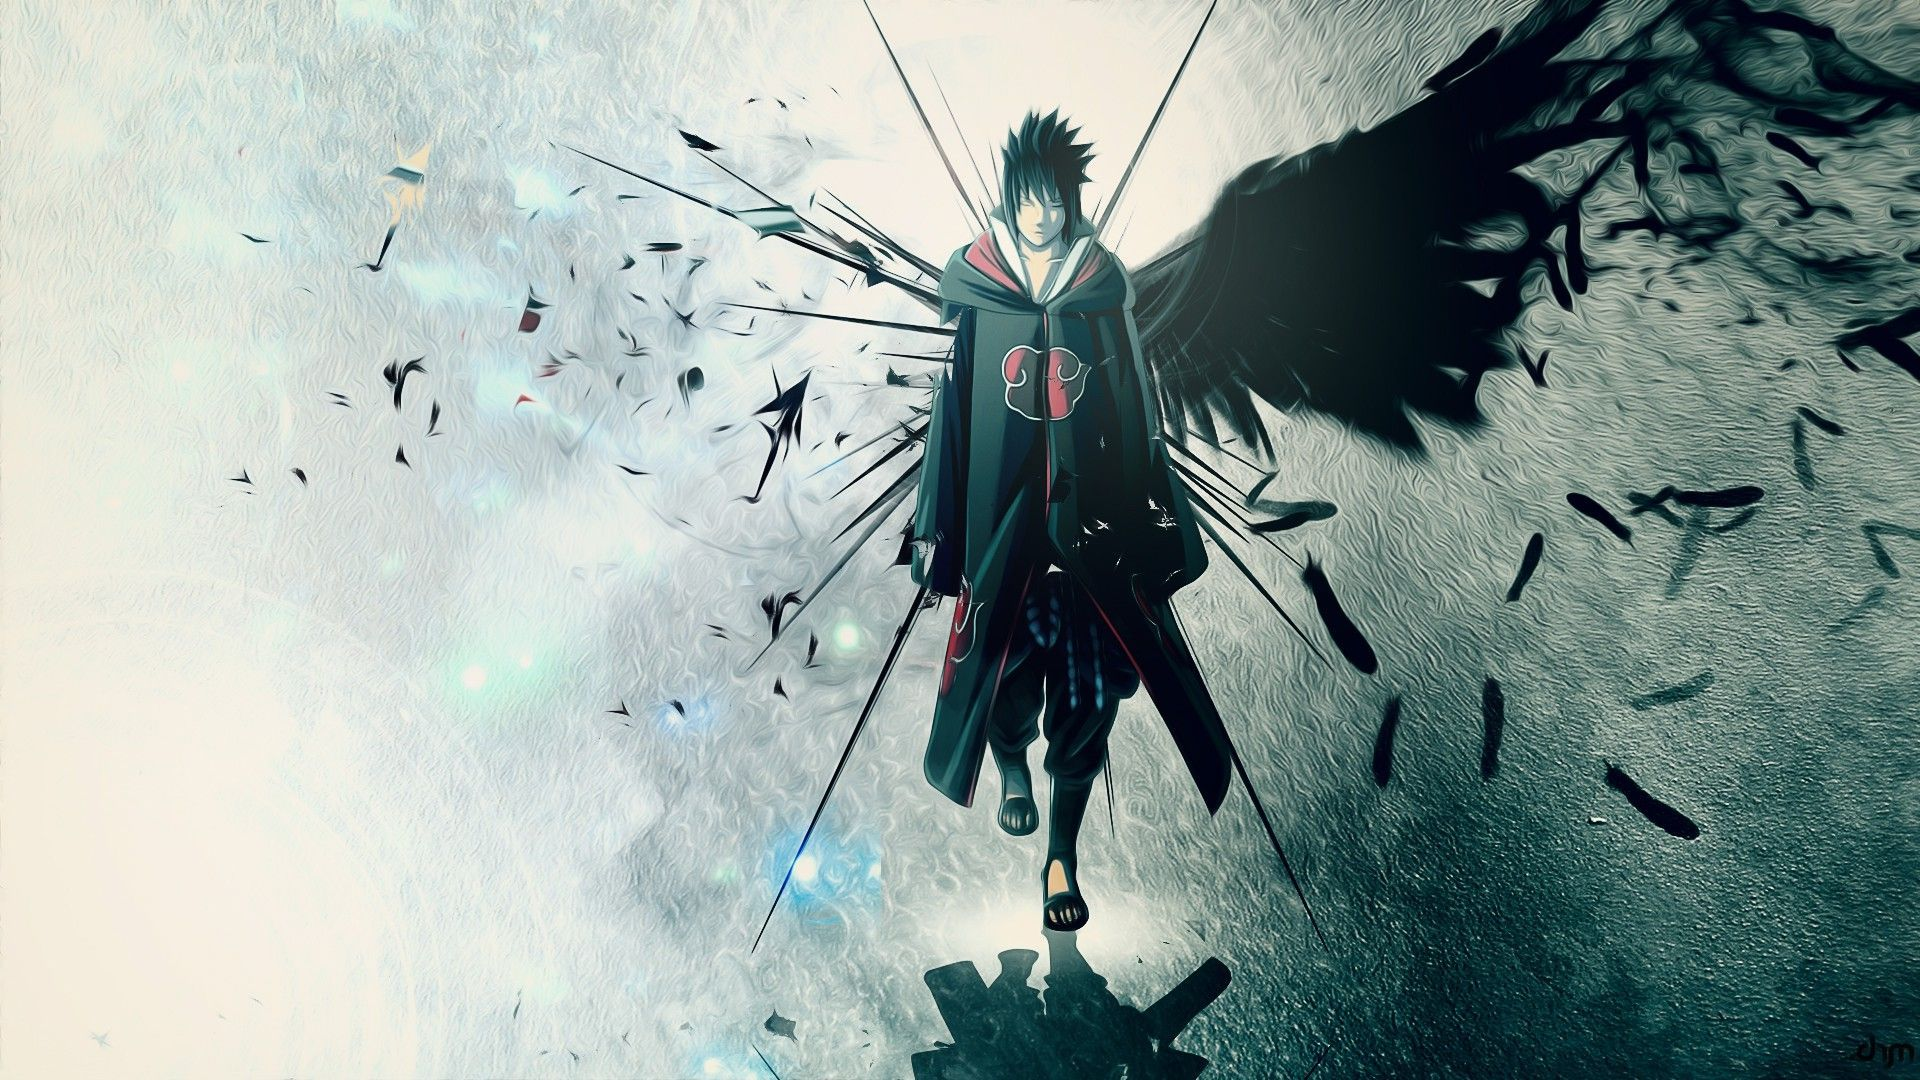 best anime wallpaper HD 1920x1080